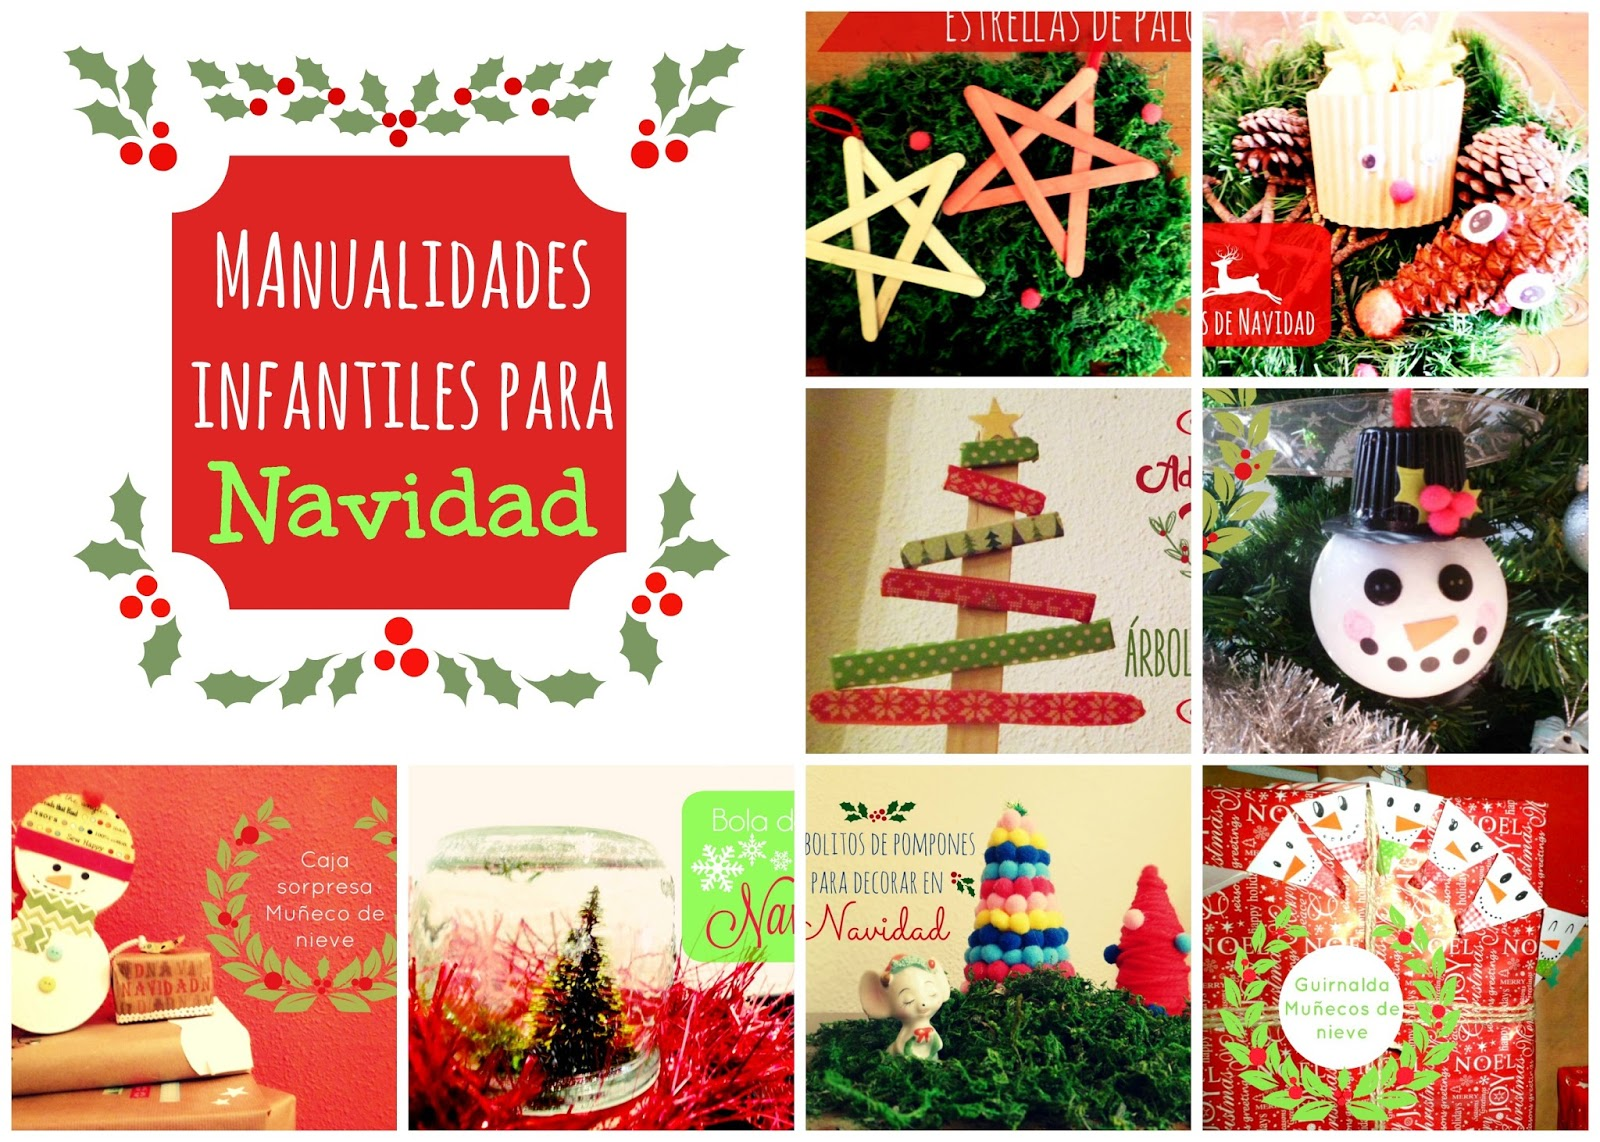 Materiales diy manualidades infantiles para navidad for Manualidades para diciembre